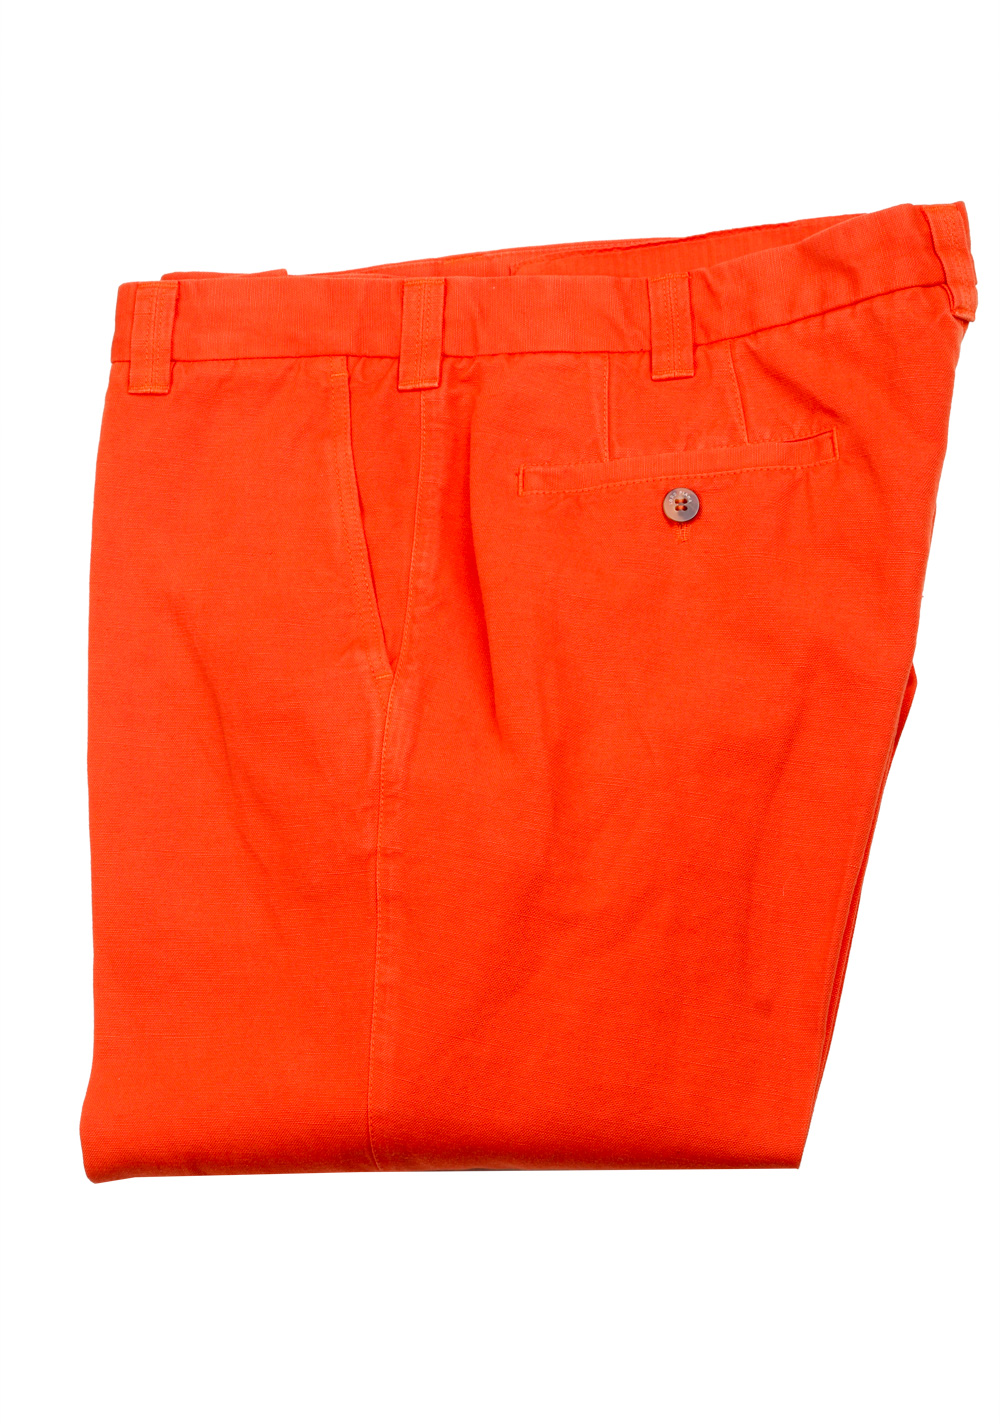 Loro Piana Orange Trousers Size 52 / 36 U.S. | Costume Limité